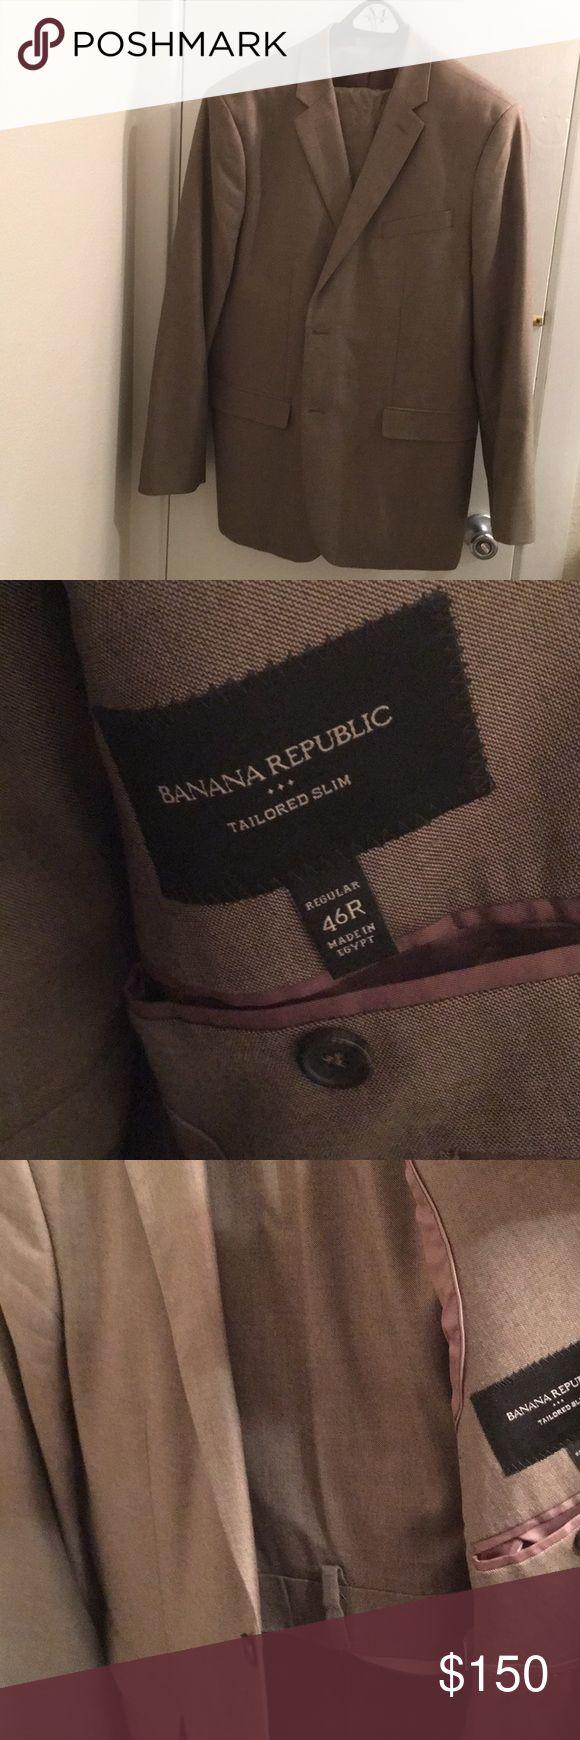 Brown Banana Republic Suit Gently used Banana Republic Suit Separates. Jacket Size 46R. Pant size 38x30. Banana Republic Suits & Blazers Suits